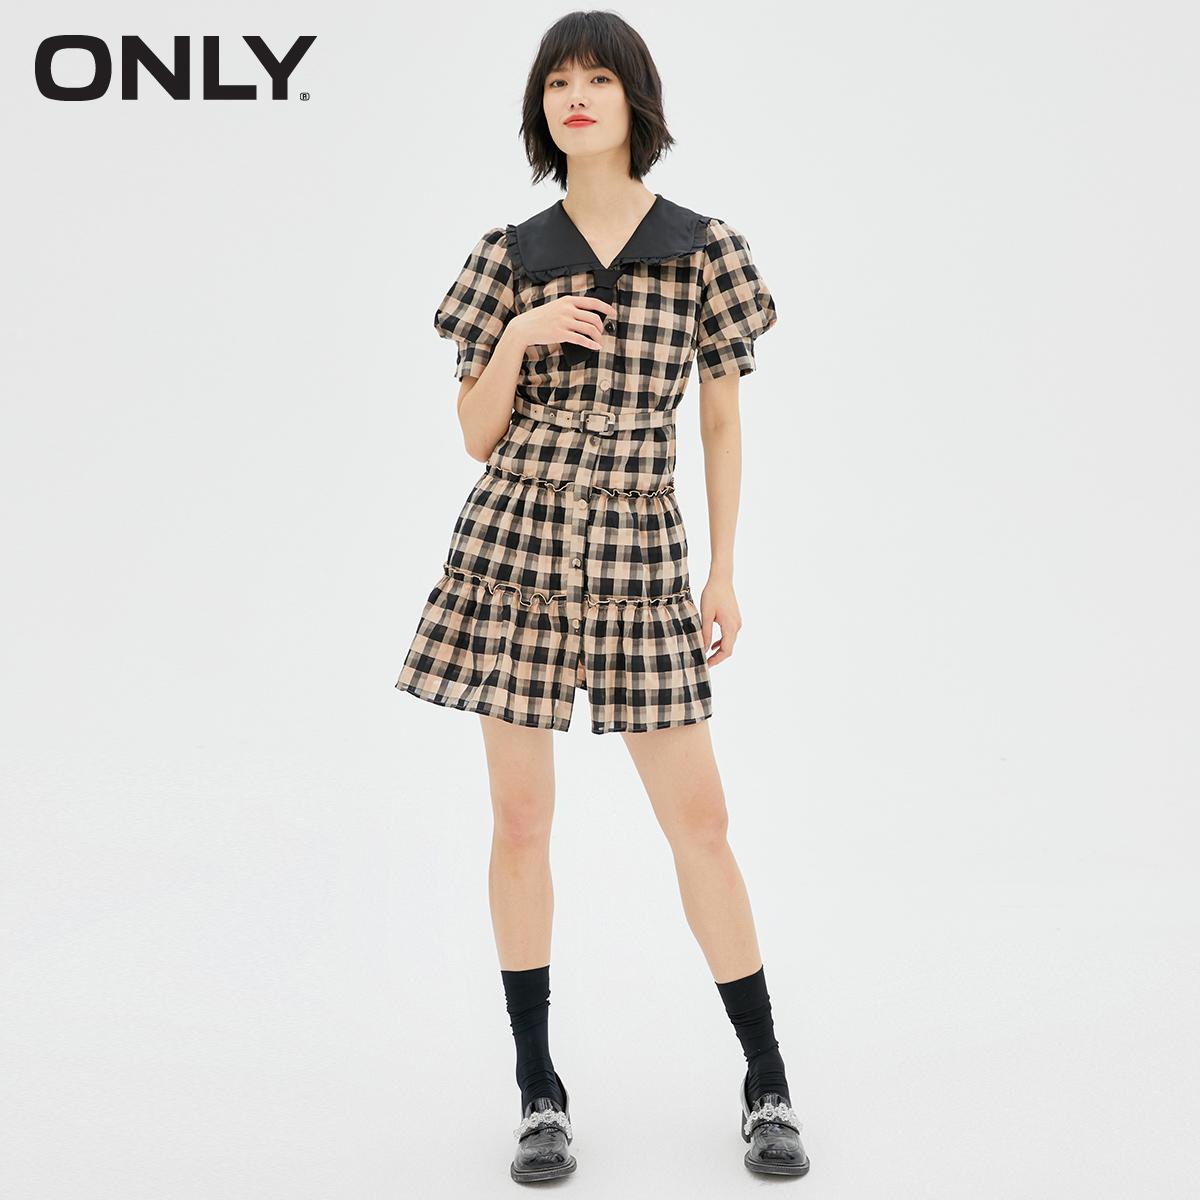 ONLY2021秋季新款JK风复古格子甜美娃娃领百搭连衣裙女